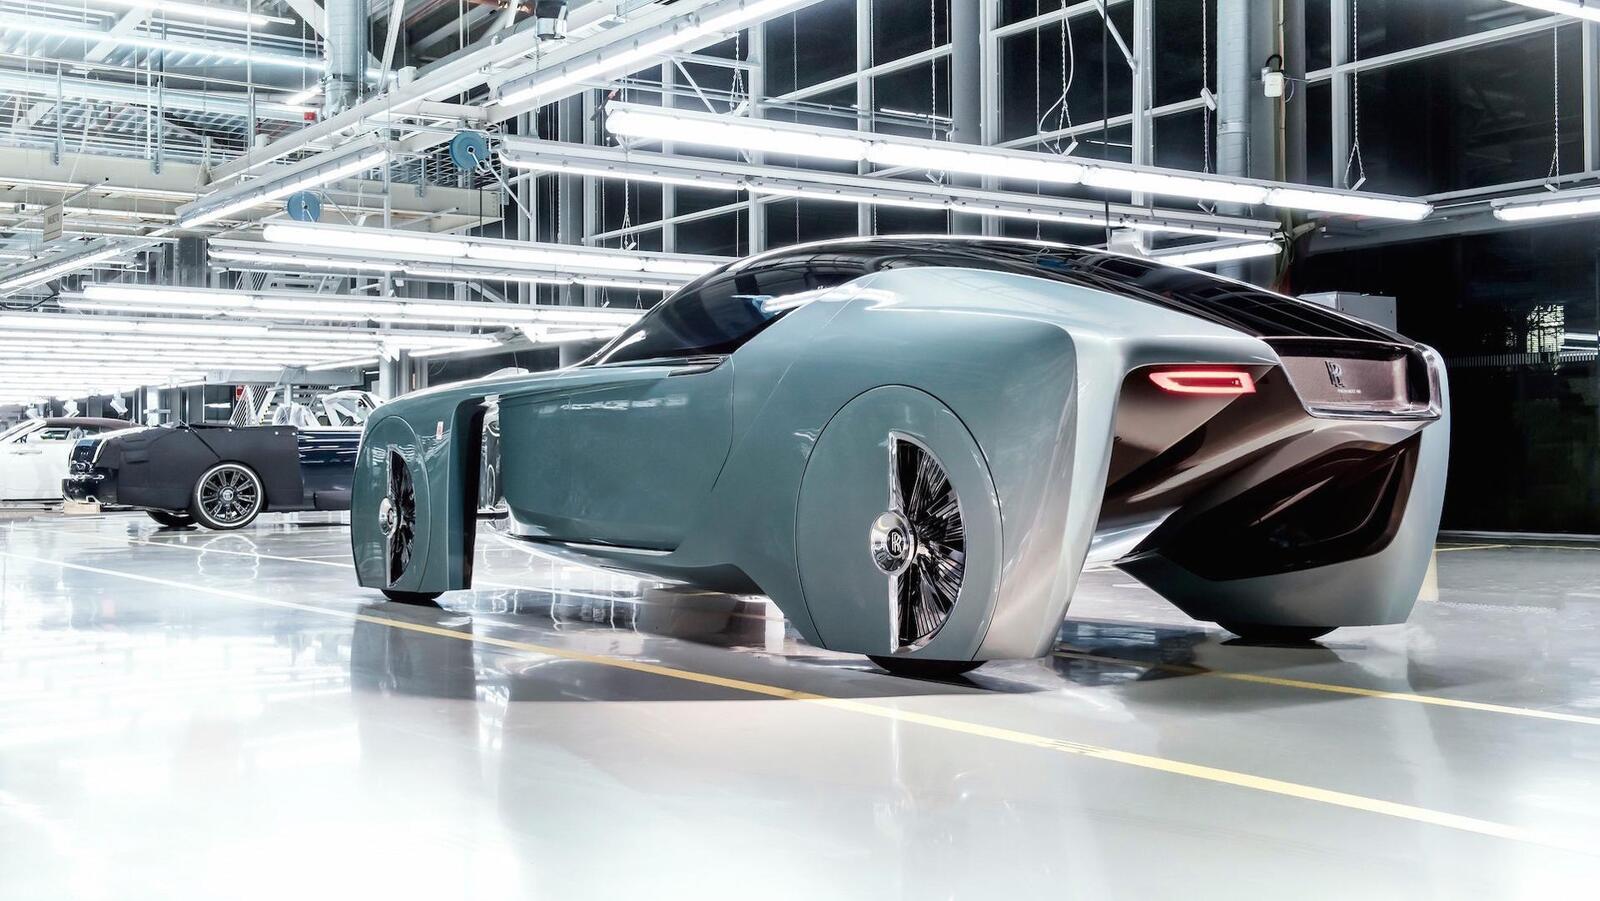 rolls-royce-vision-next-100-concept6.jpg